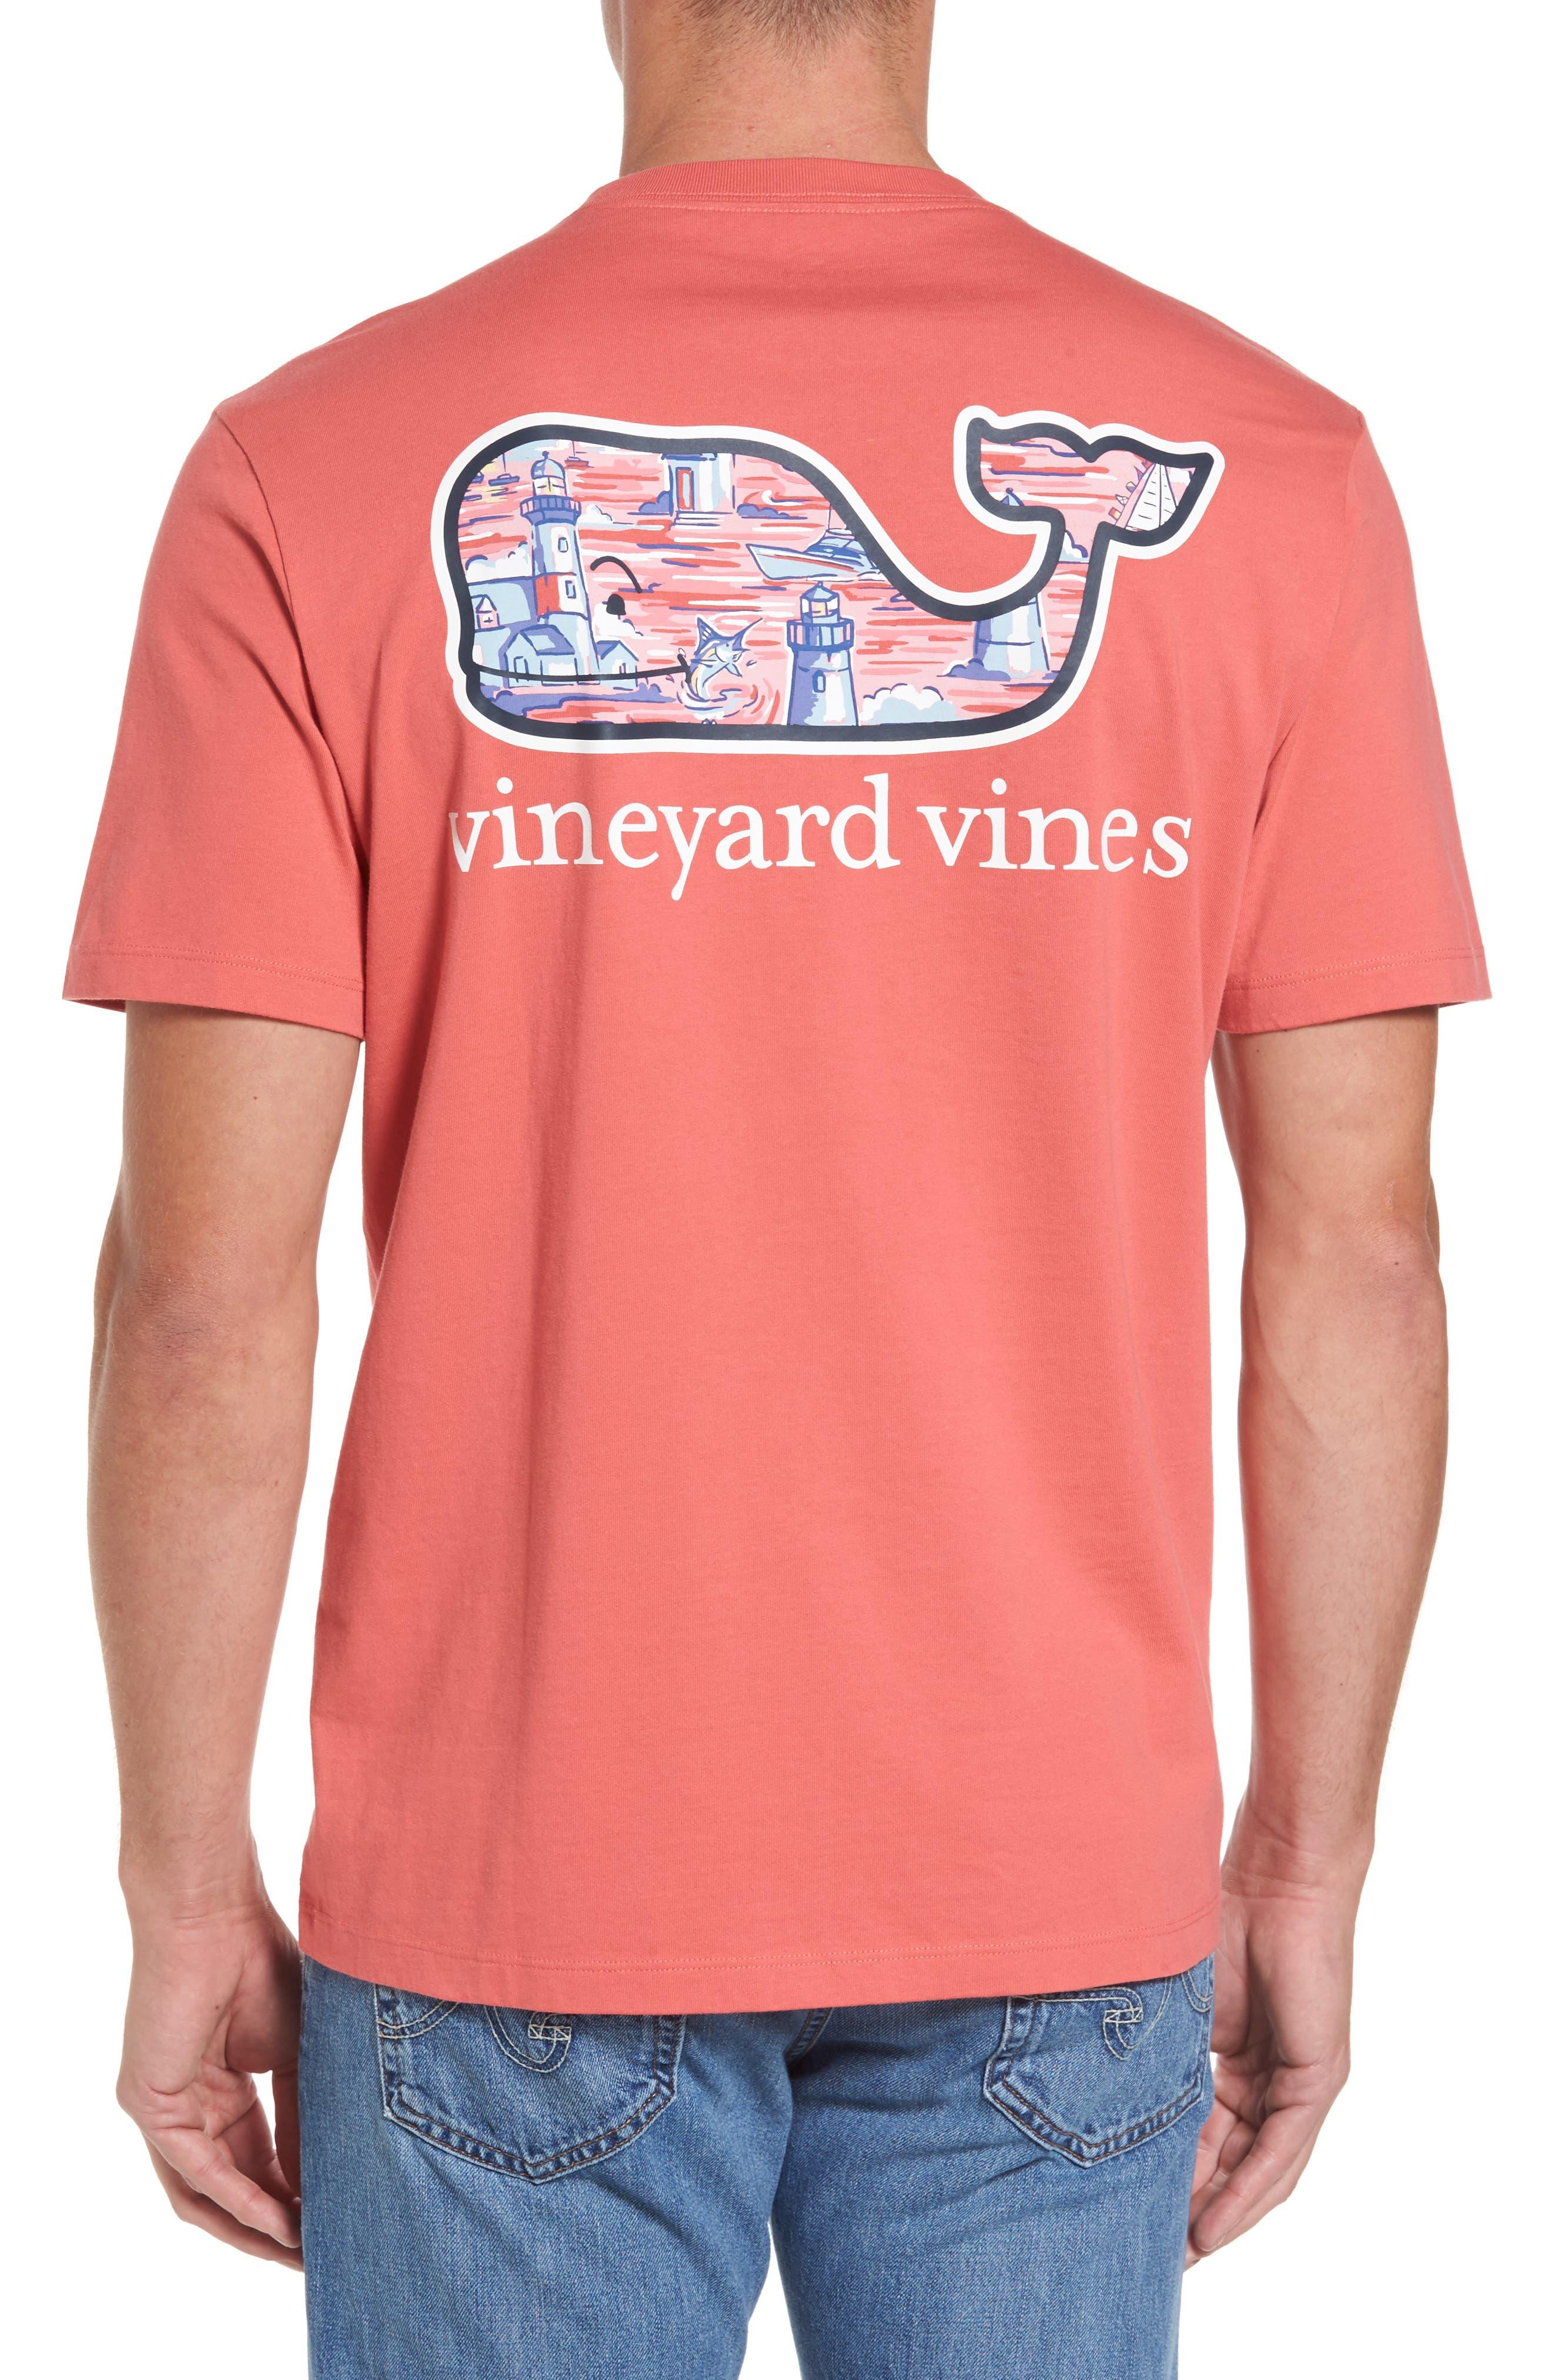 Alternate Image 1 Selected - vineyard vines Lighthouse Whale Pocket T-Shirt